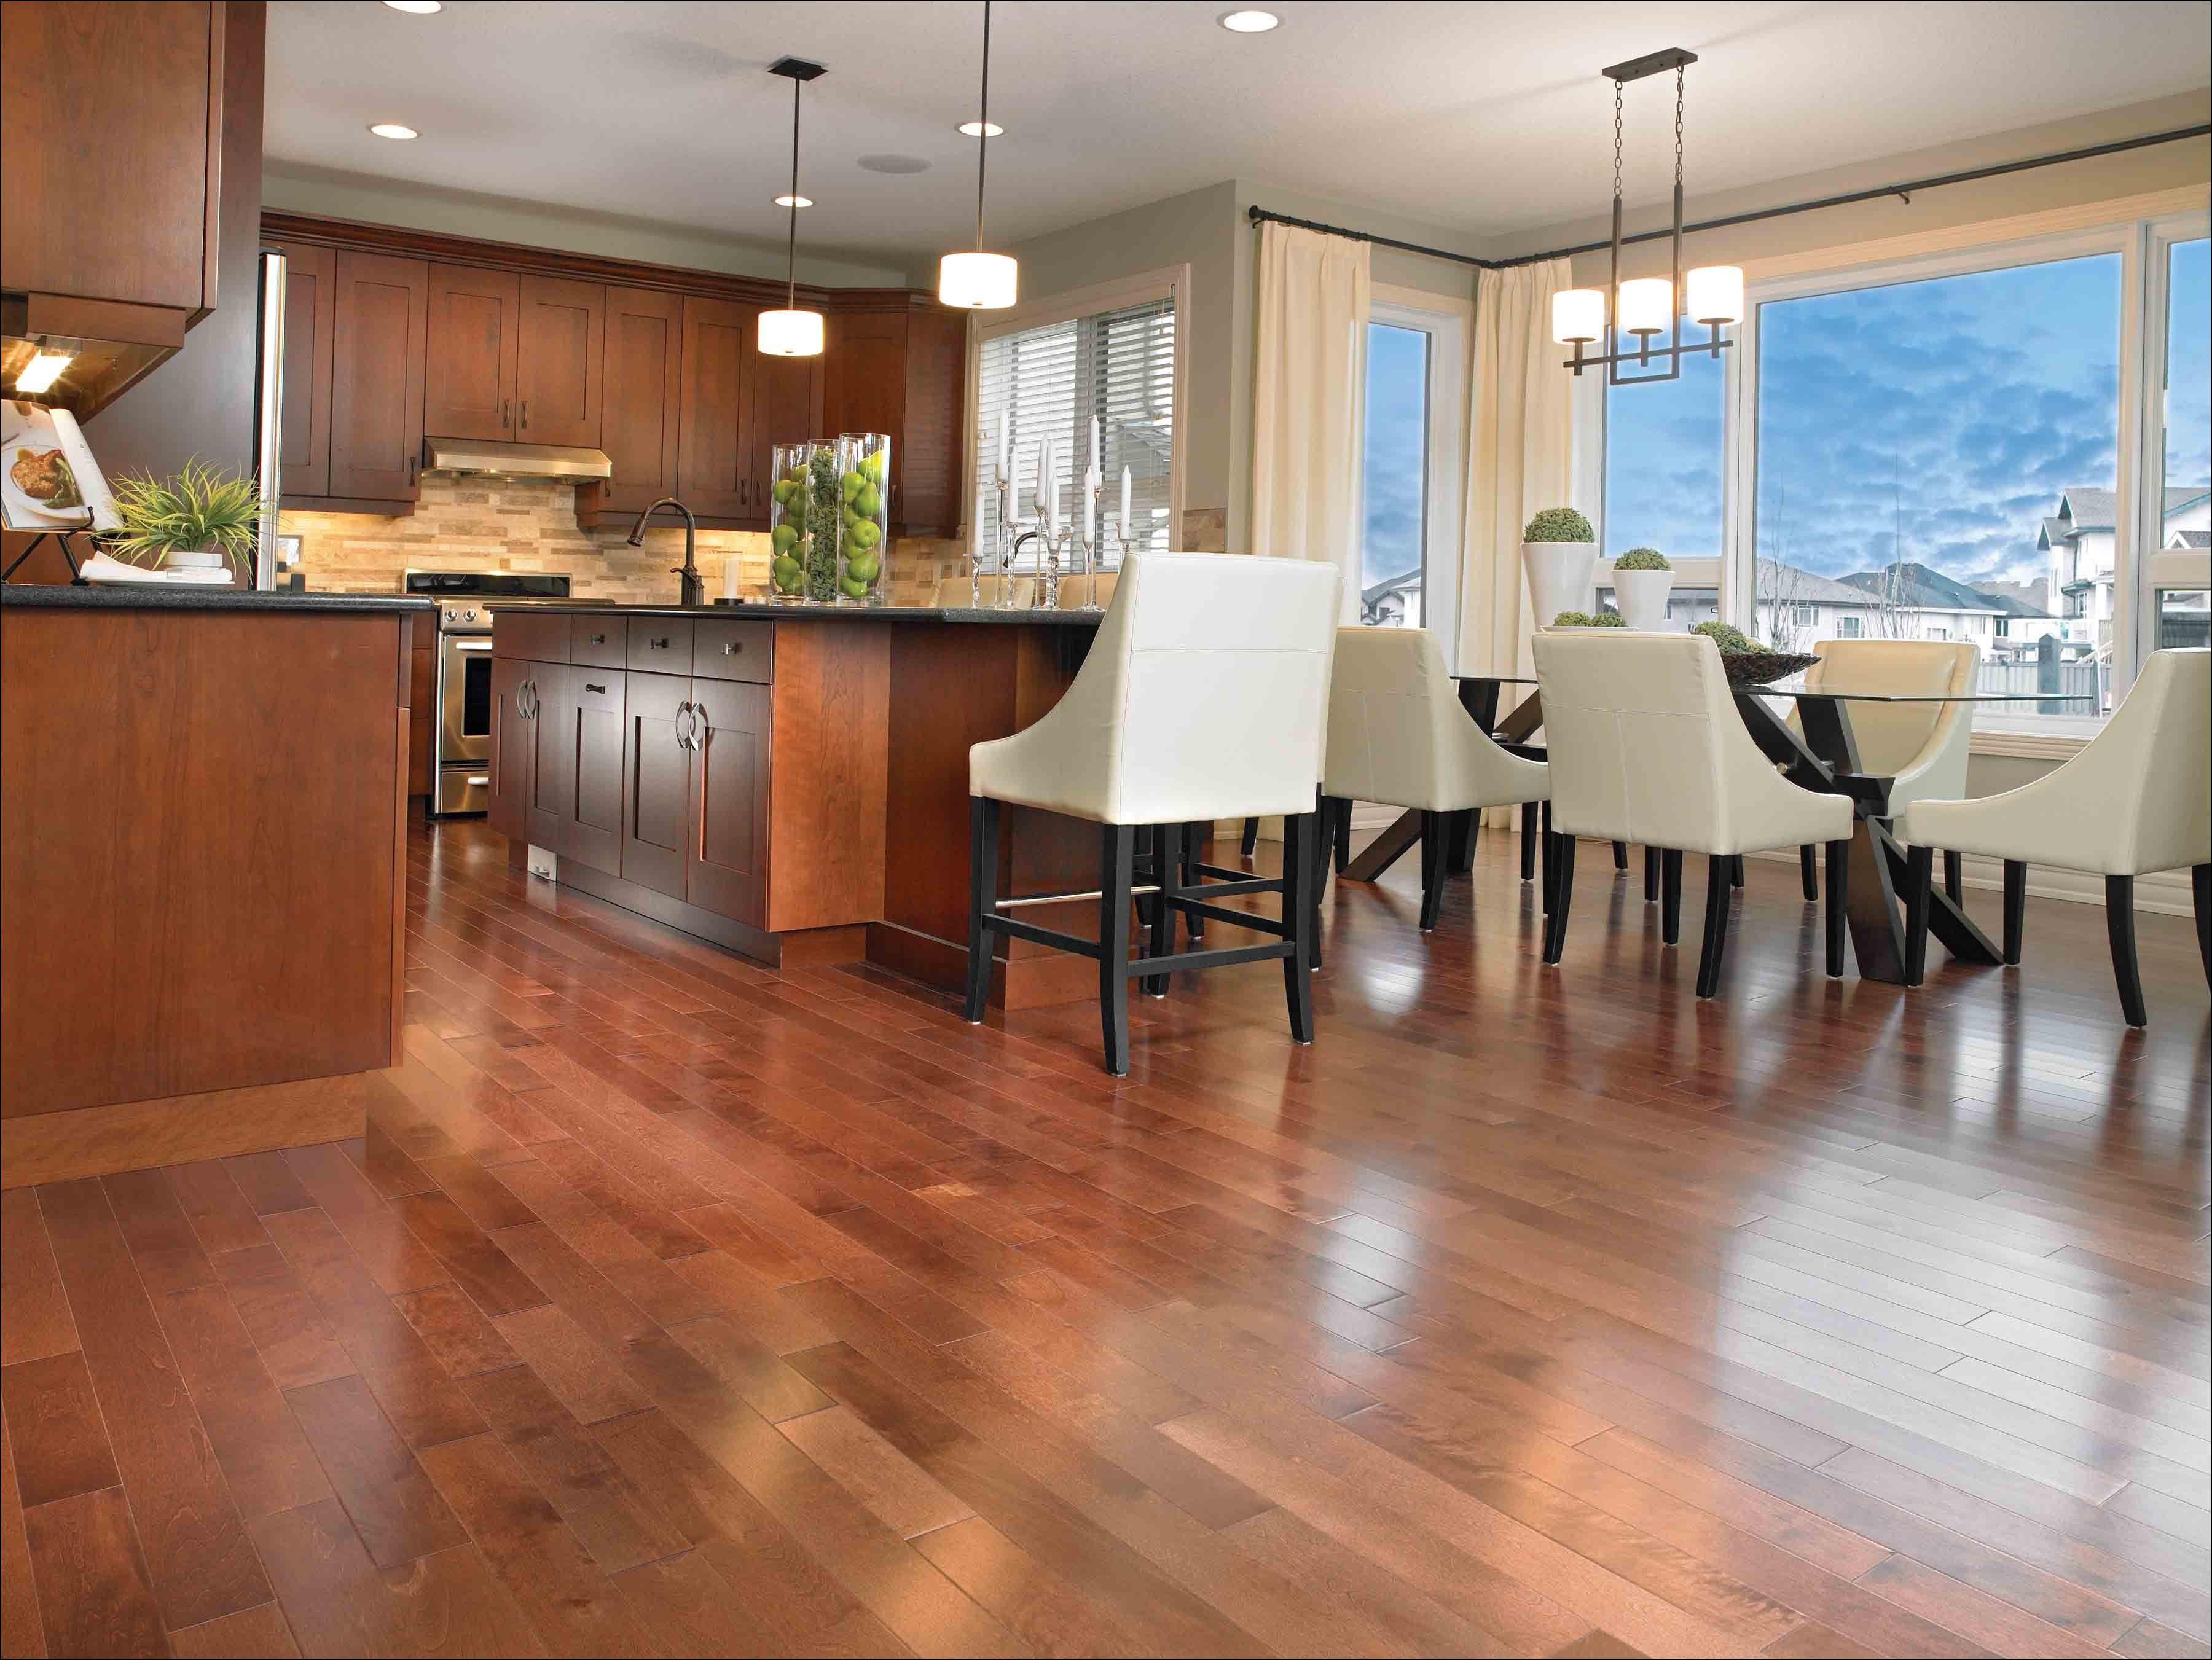 higgins hardwood flooring reviews of hardwood flooring suppliers france flooring ideas for hardwood flooring installation san diego images 54 best exotic flooring images on pinterest of hardwood flooring